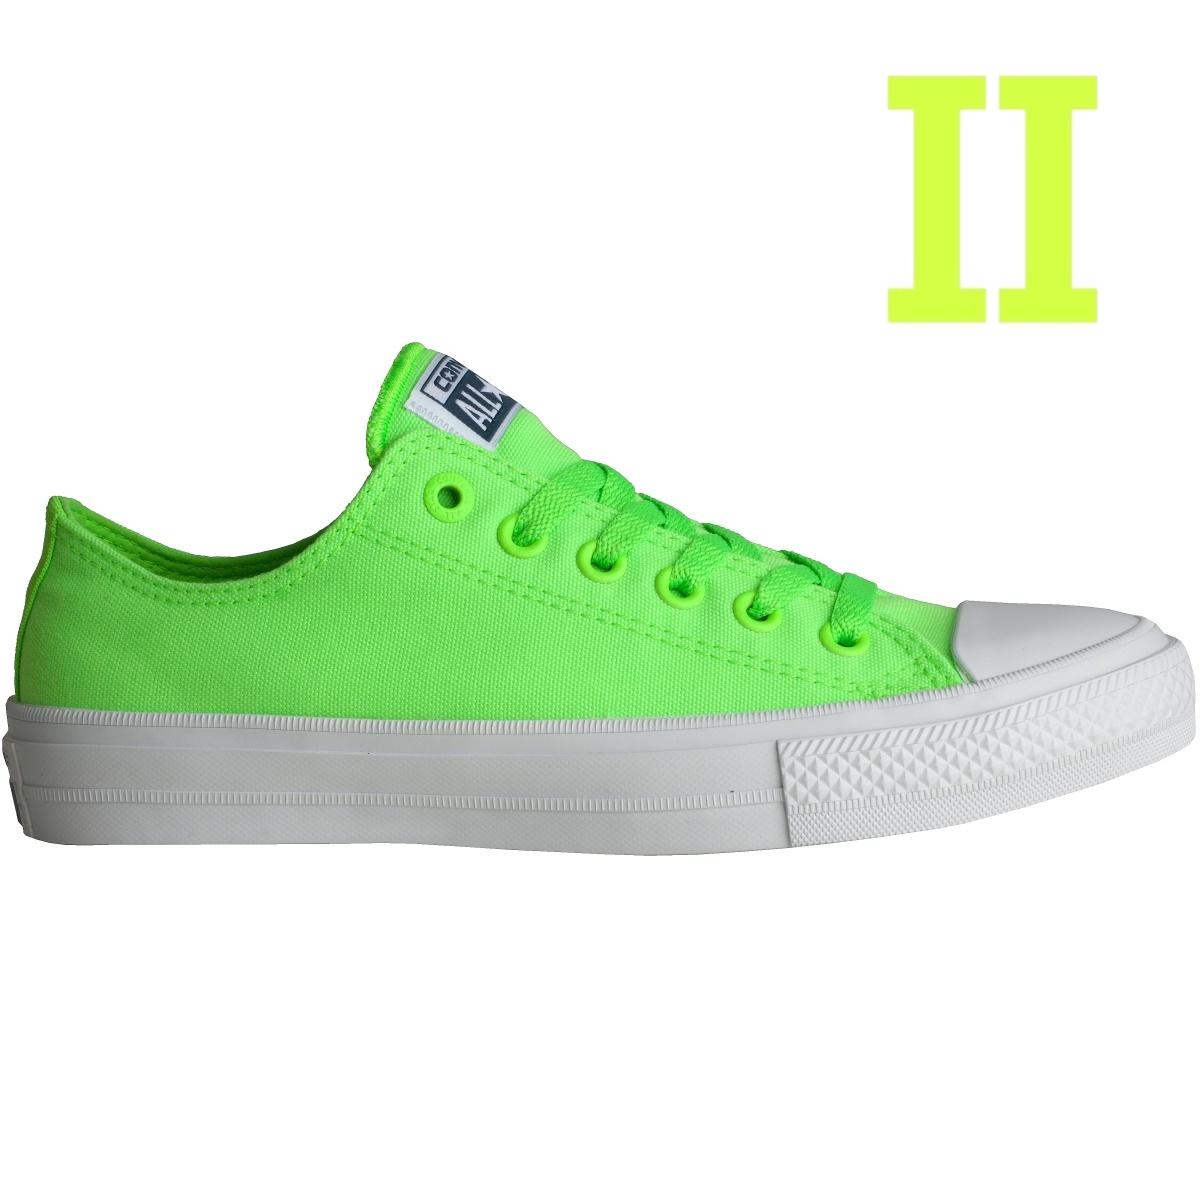 Converse Chuck Taylor All Star II zelená EUR 37 33efe9b4a0